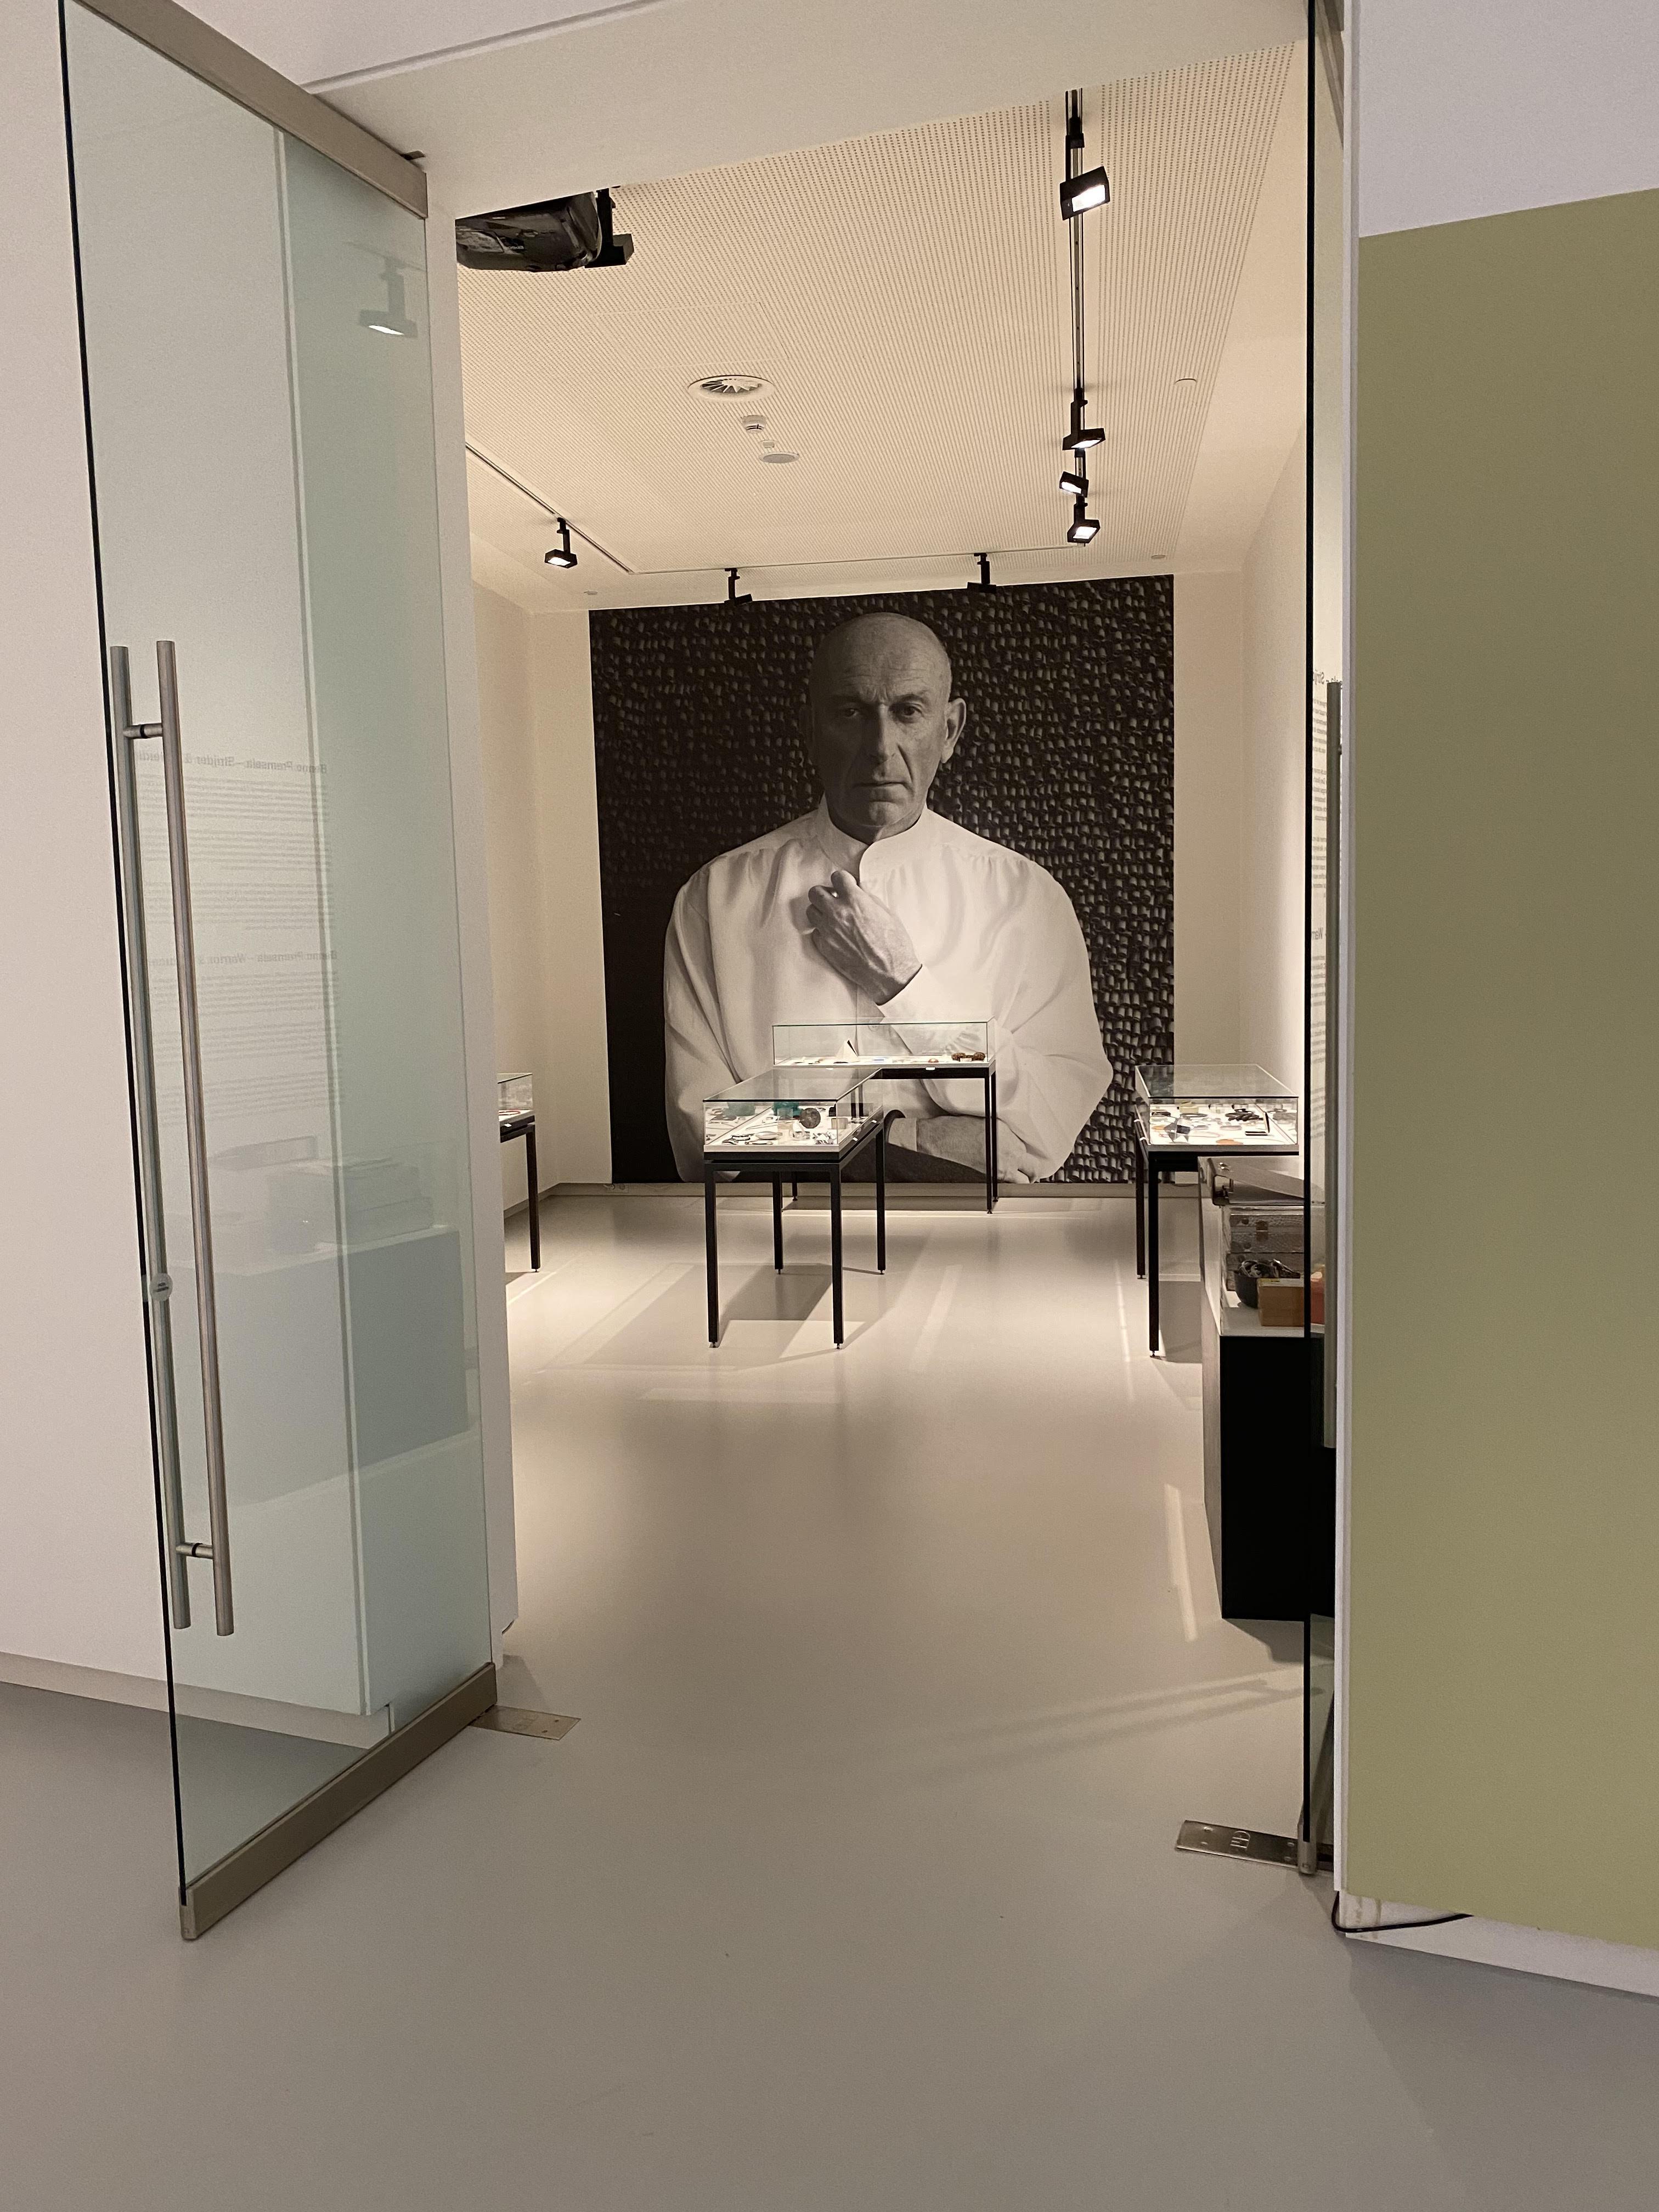 Collectie Benno Premsela, Design Museum Den Bosch, 2021. Foto Hans Appenzeller, tentoonstelling, vitrines, portret